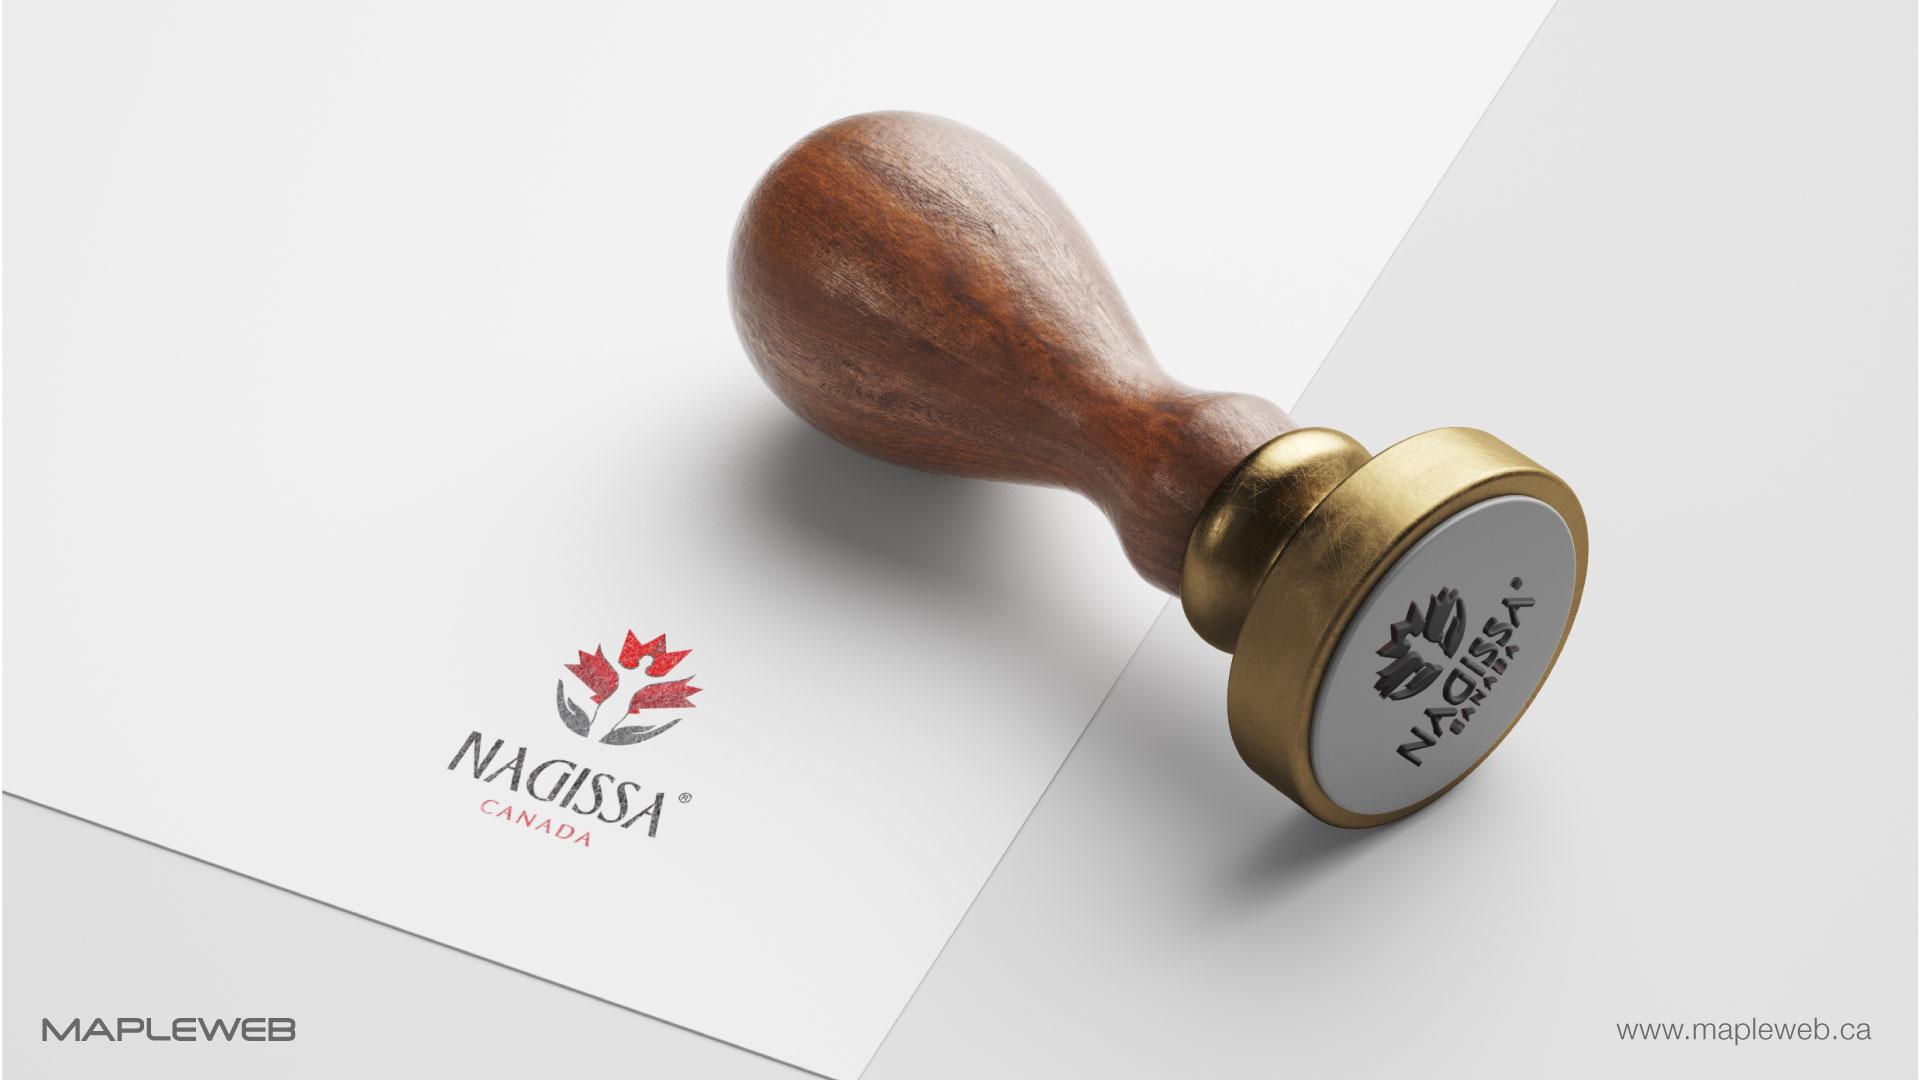 nagissa-canada-brand-logo-design-by-mapleweb-vancouver-canada-logo-on-stamp-mock